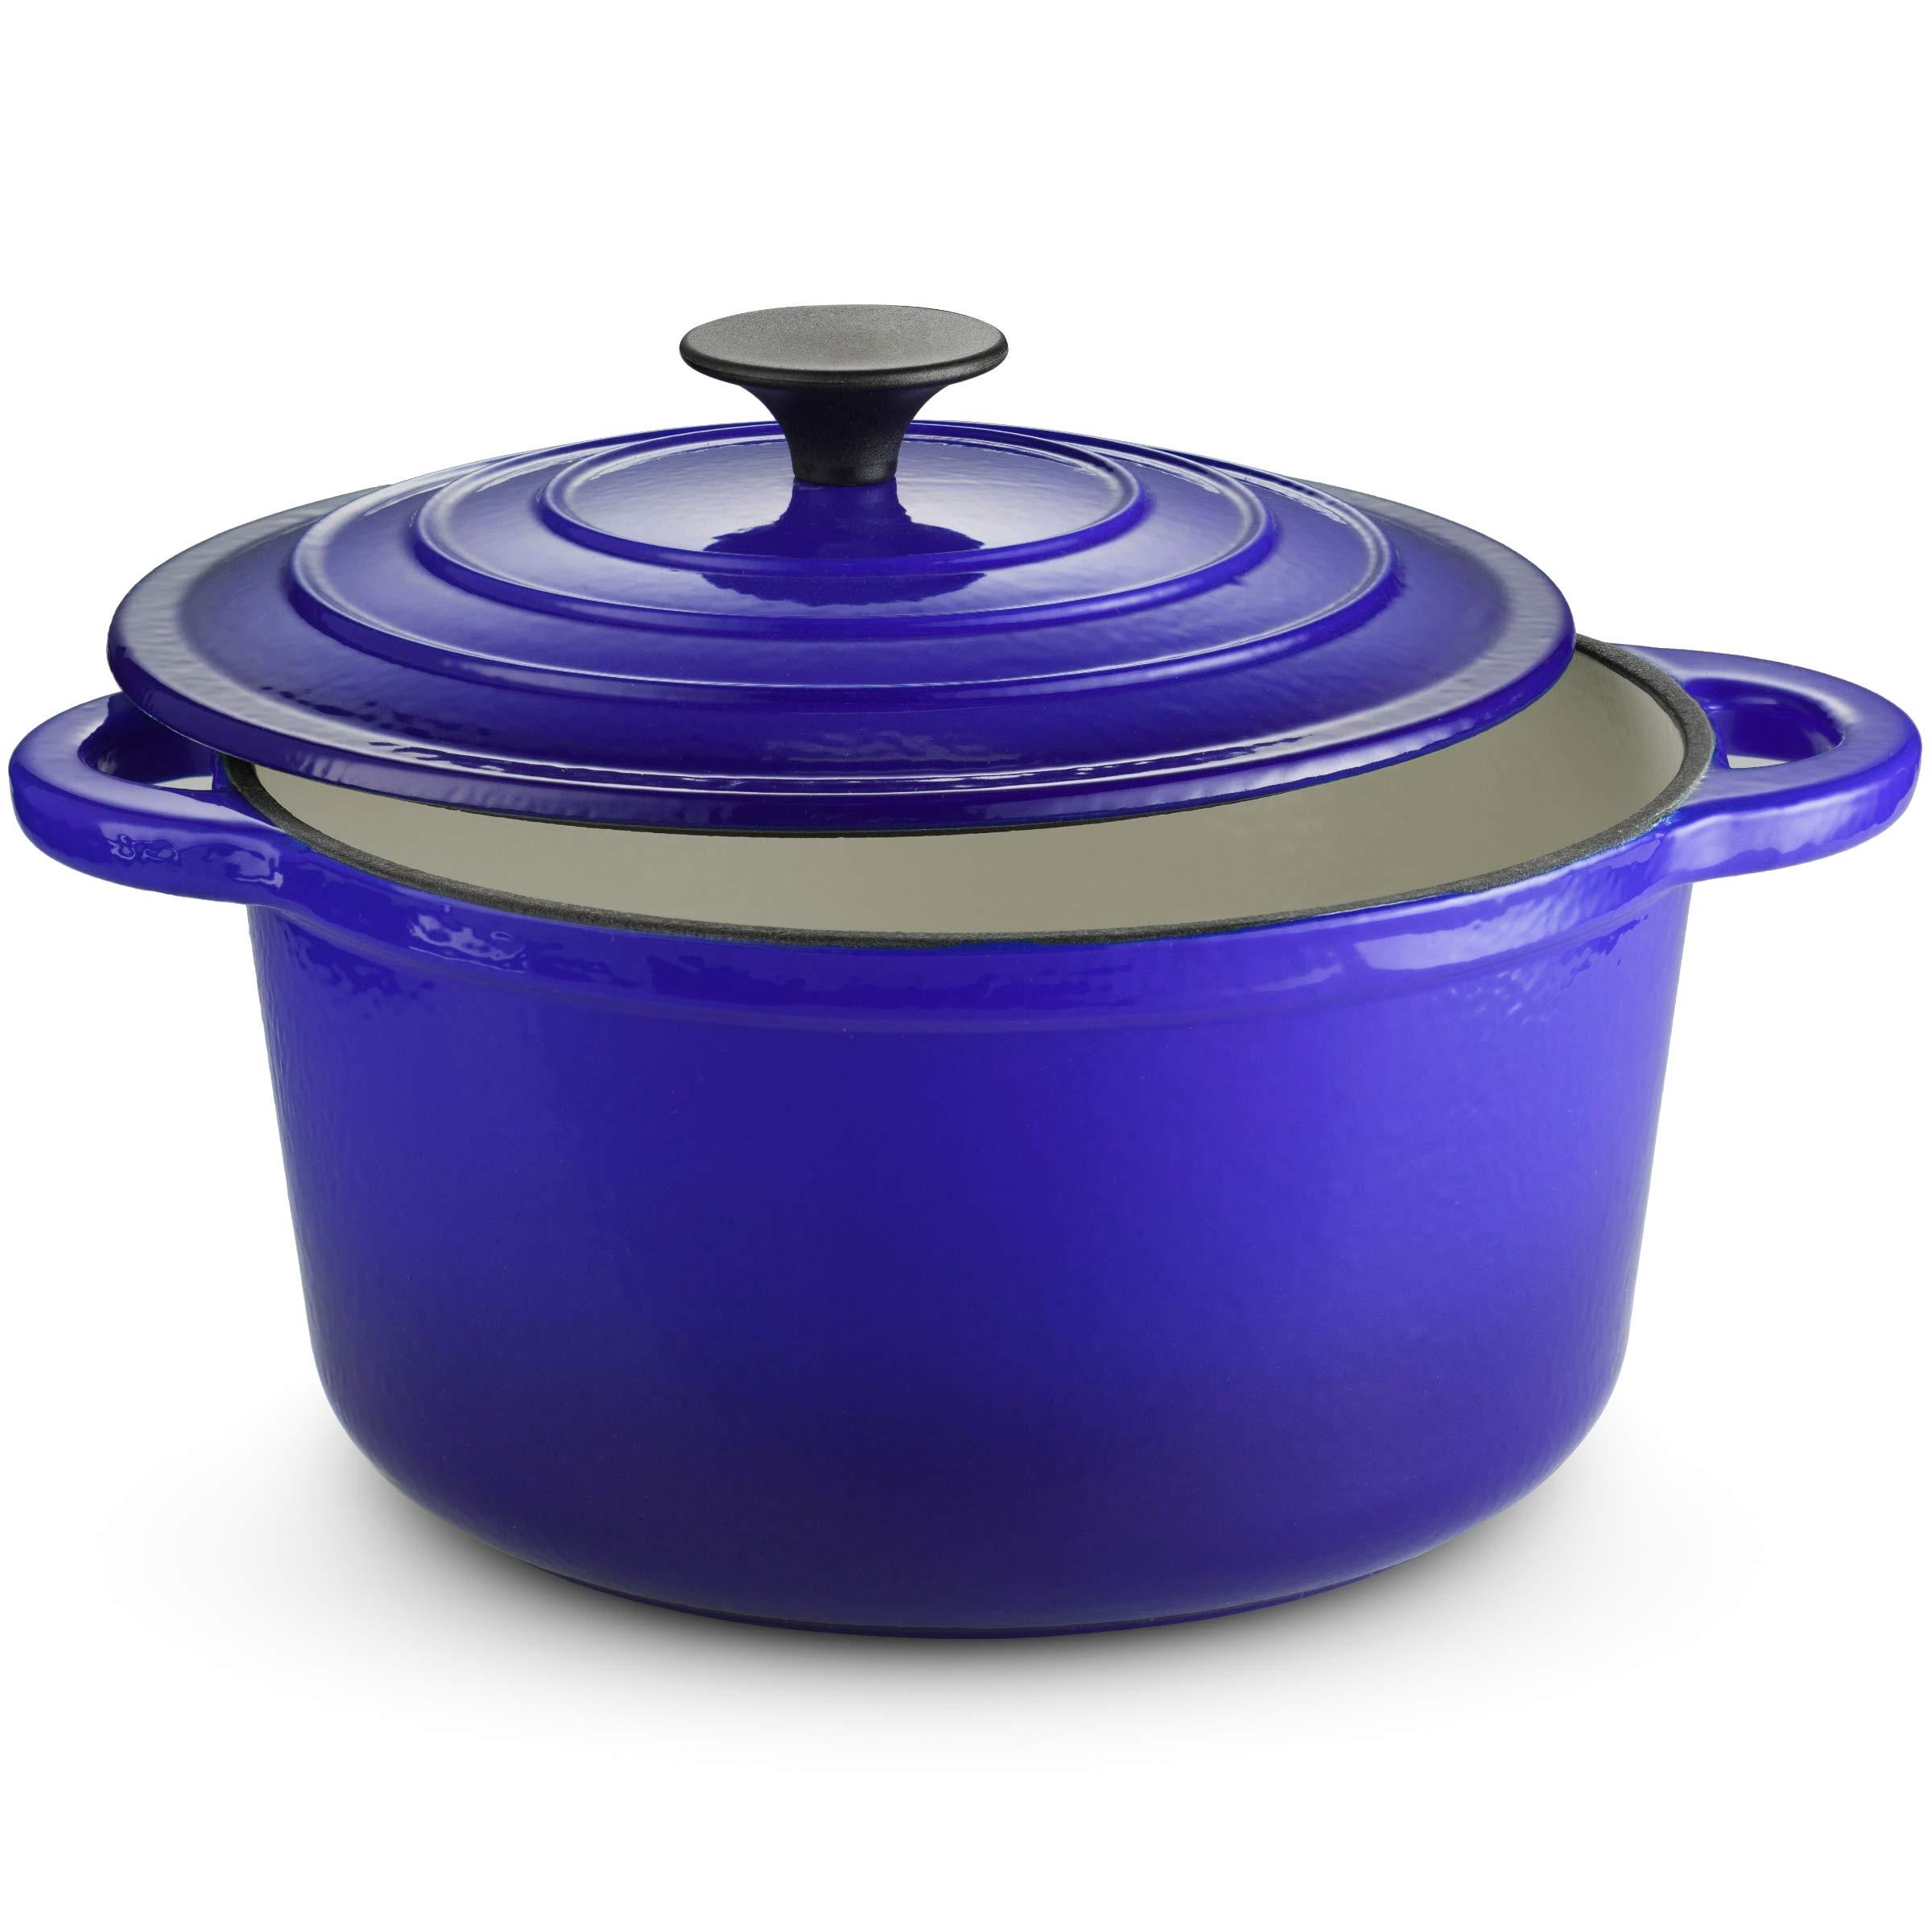 Klee Enameled Cast Iron Dutch Oven Casserole Dish with Self-Basting Cast Iron Lid, 4-Quart (Blue)